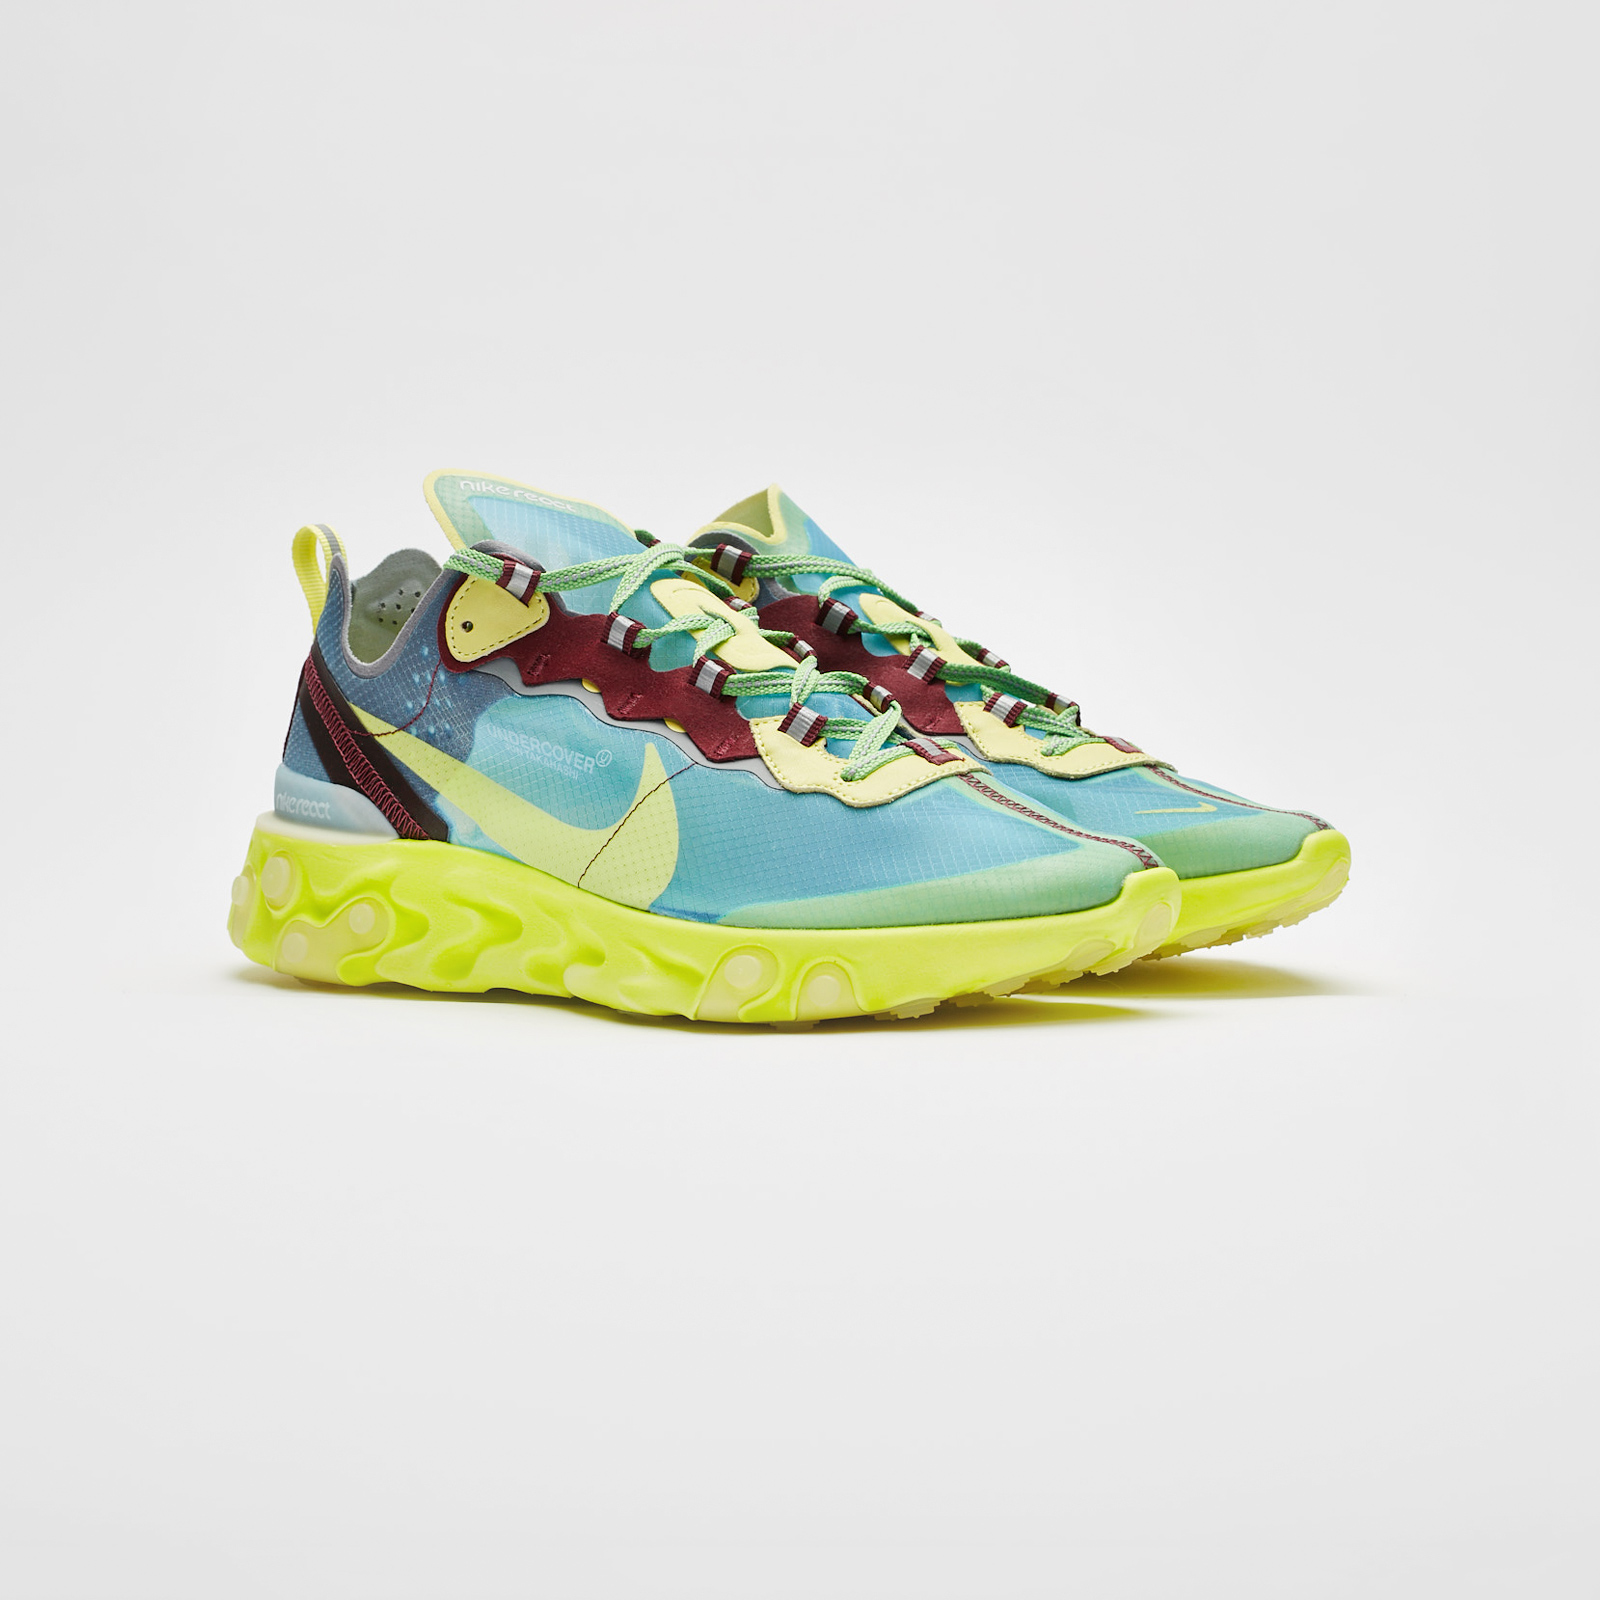 e4278e7502396 Nike React Element 87 x Undercover - Bq2718-400 - Sneakersnstuff ...